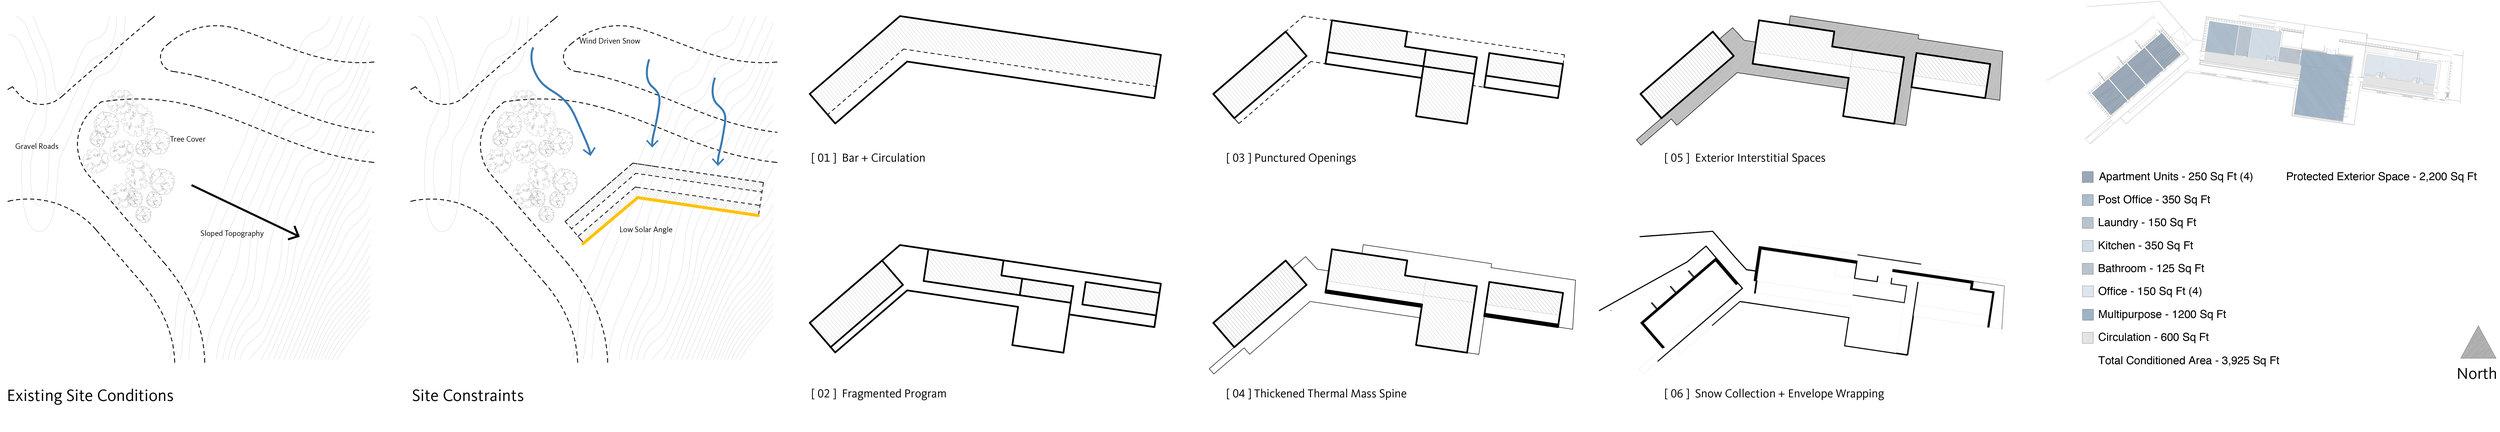 Sequence Diagram.jpg